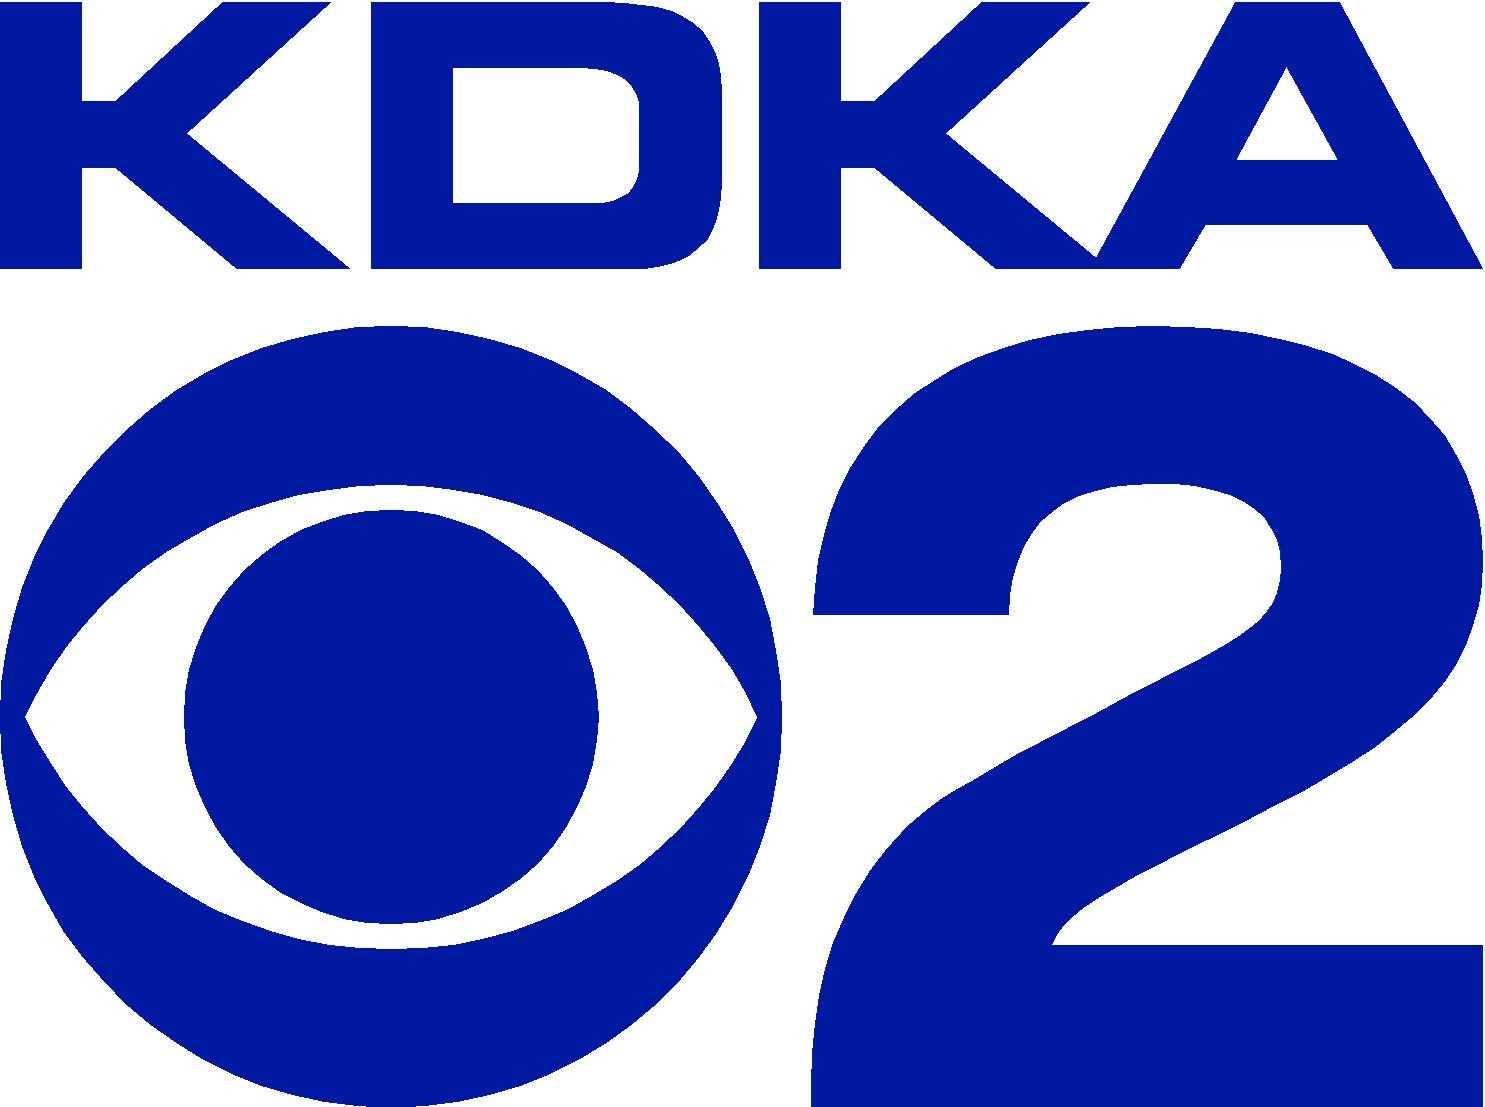 KDKA TV